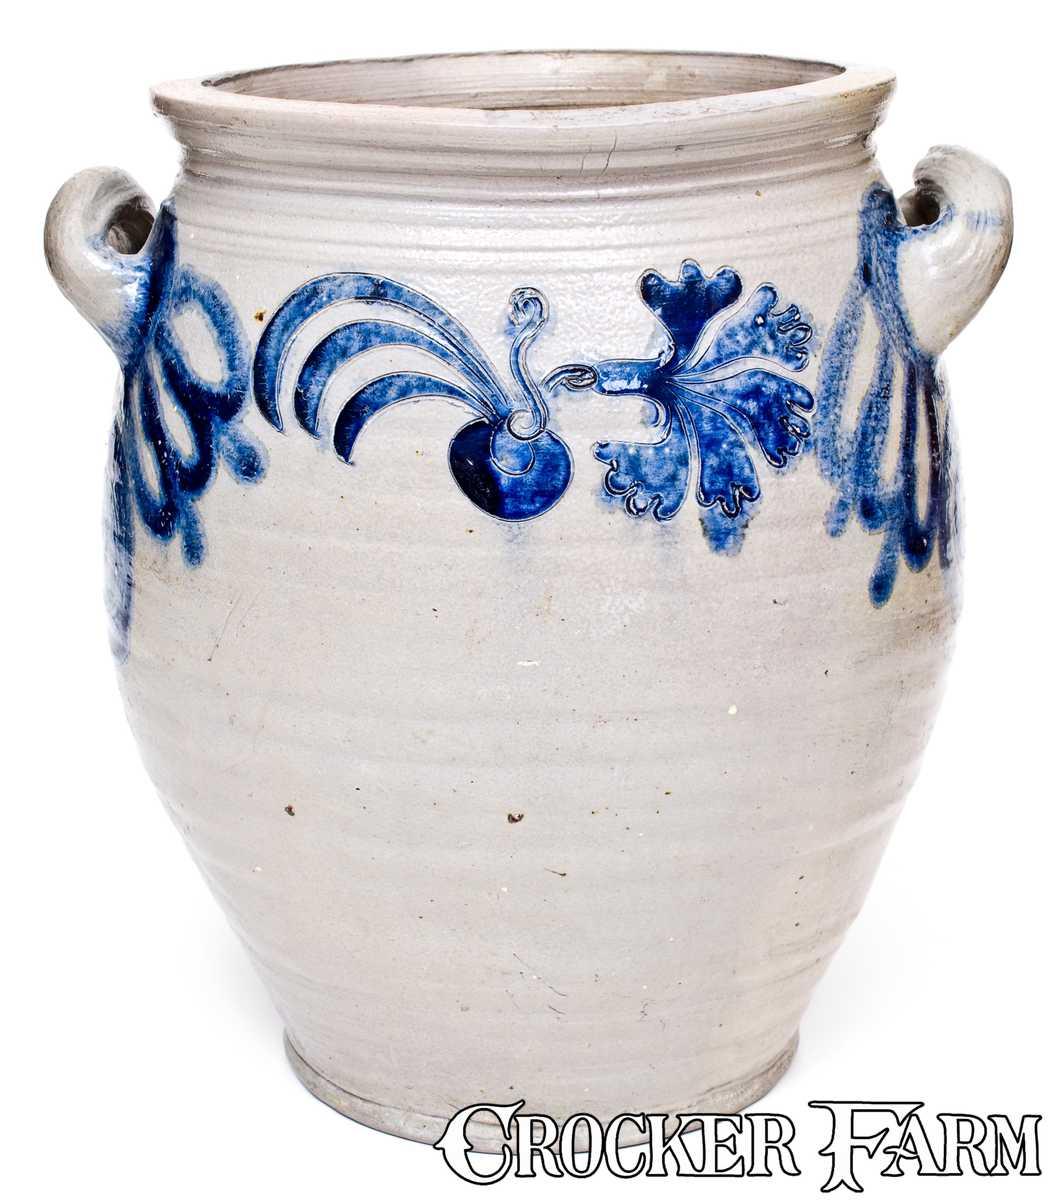 New Jersey Stoneware - Crocker Farm Stoneware Auction